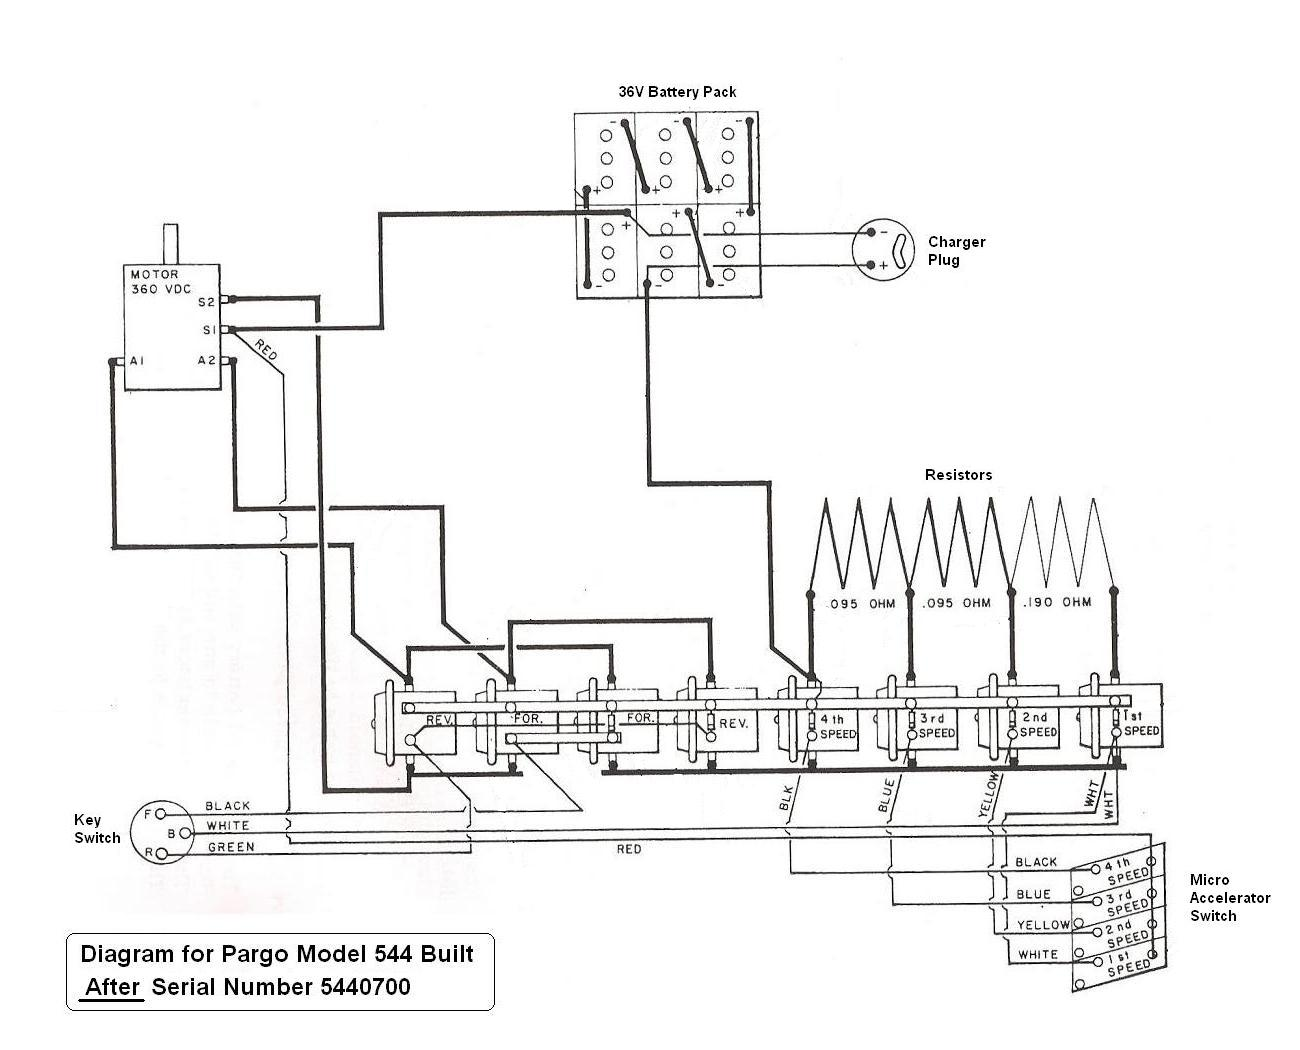 36 Volt Battery Wiring Diagram Moreover Ez Go Golf Cart Wiring Diagram